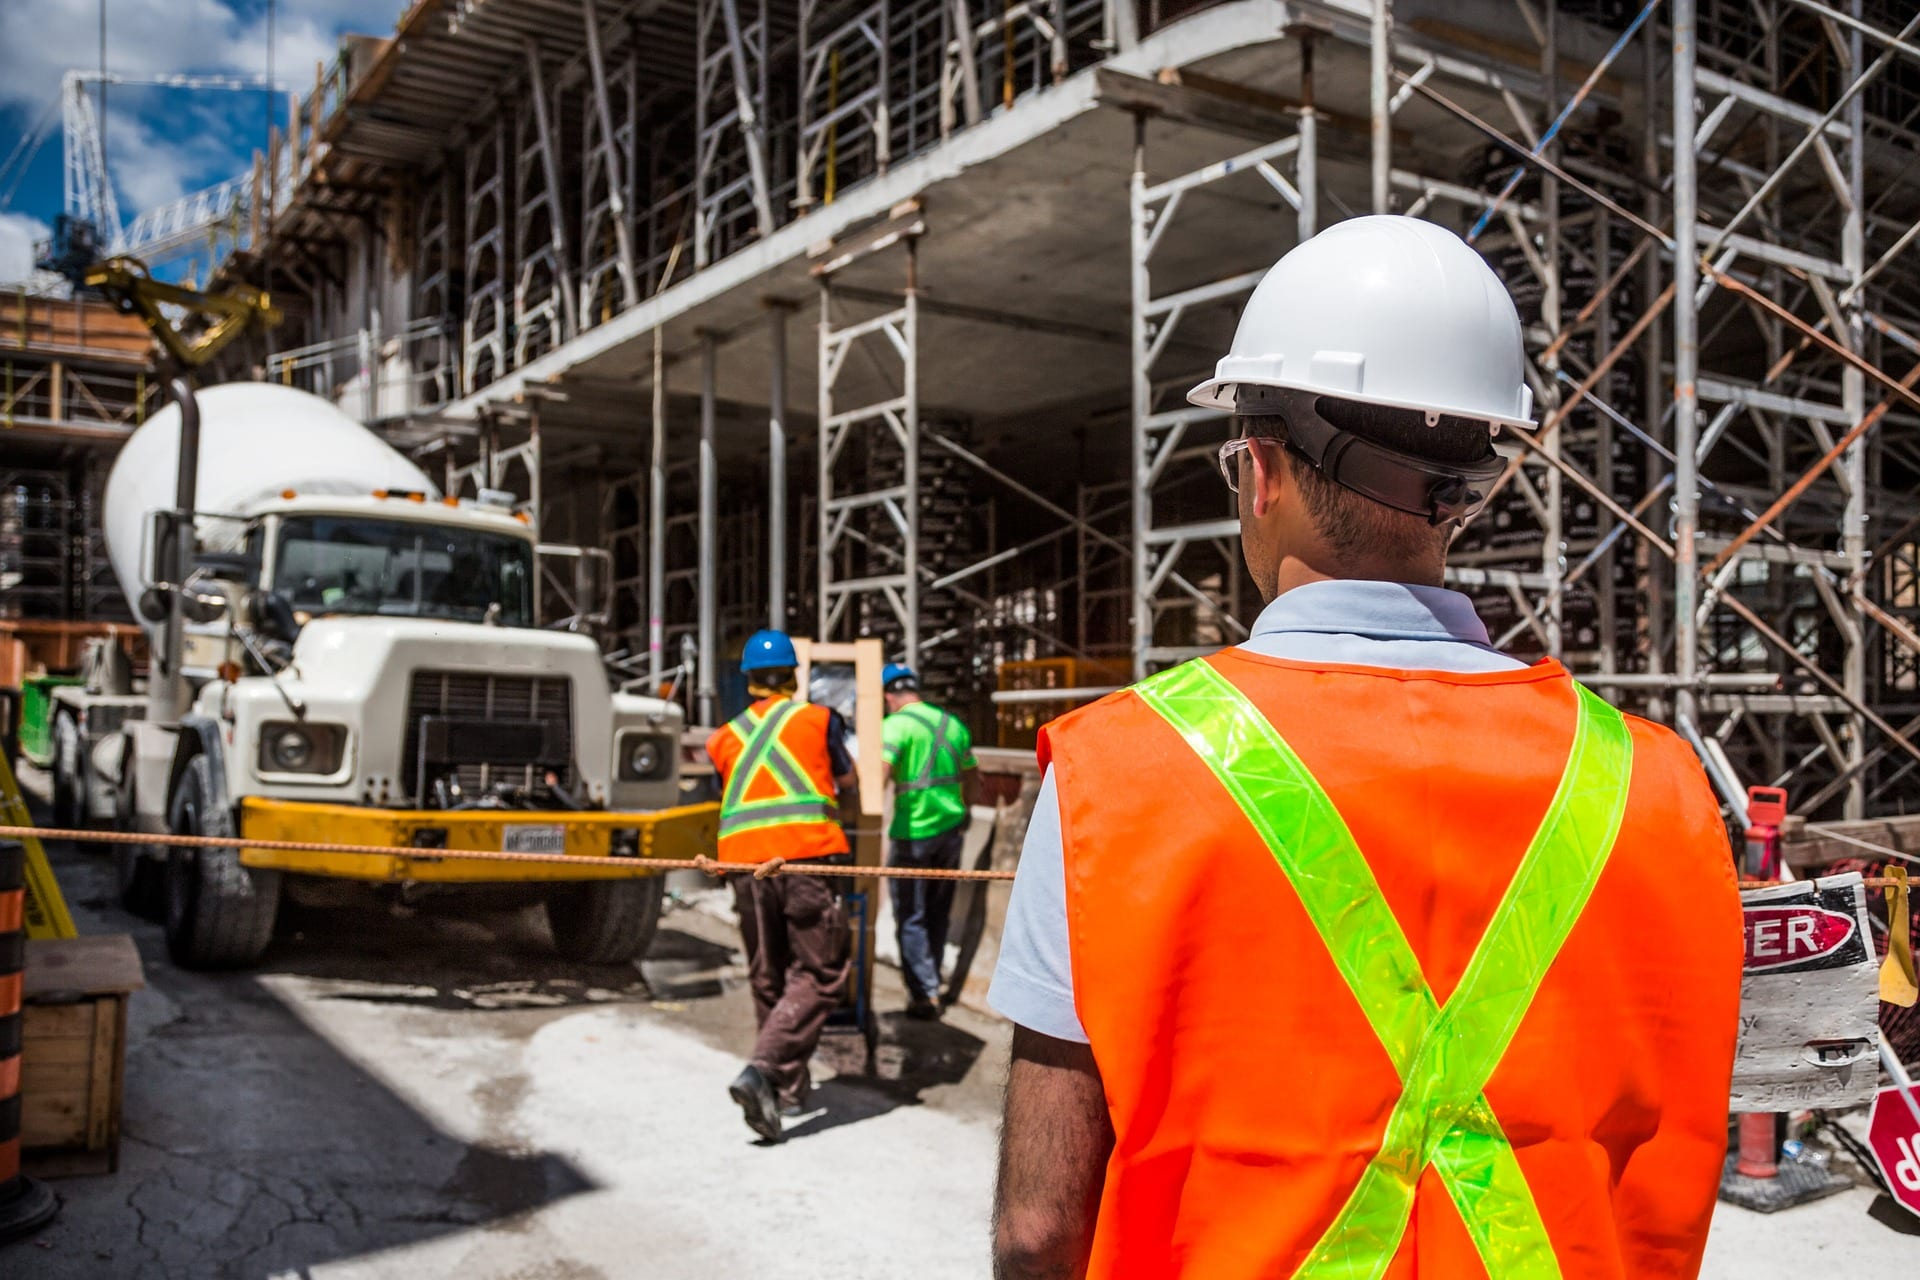 IWD 2020: Women still suffer gender bias in construction industry